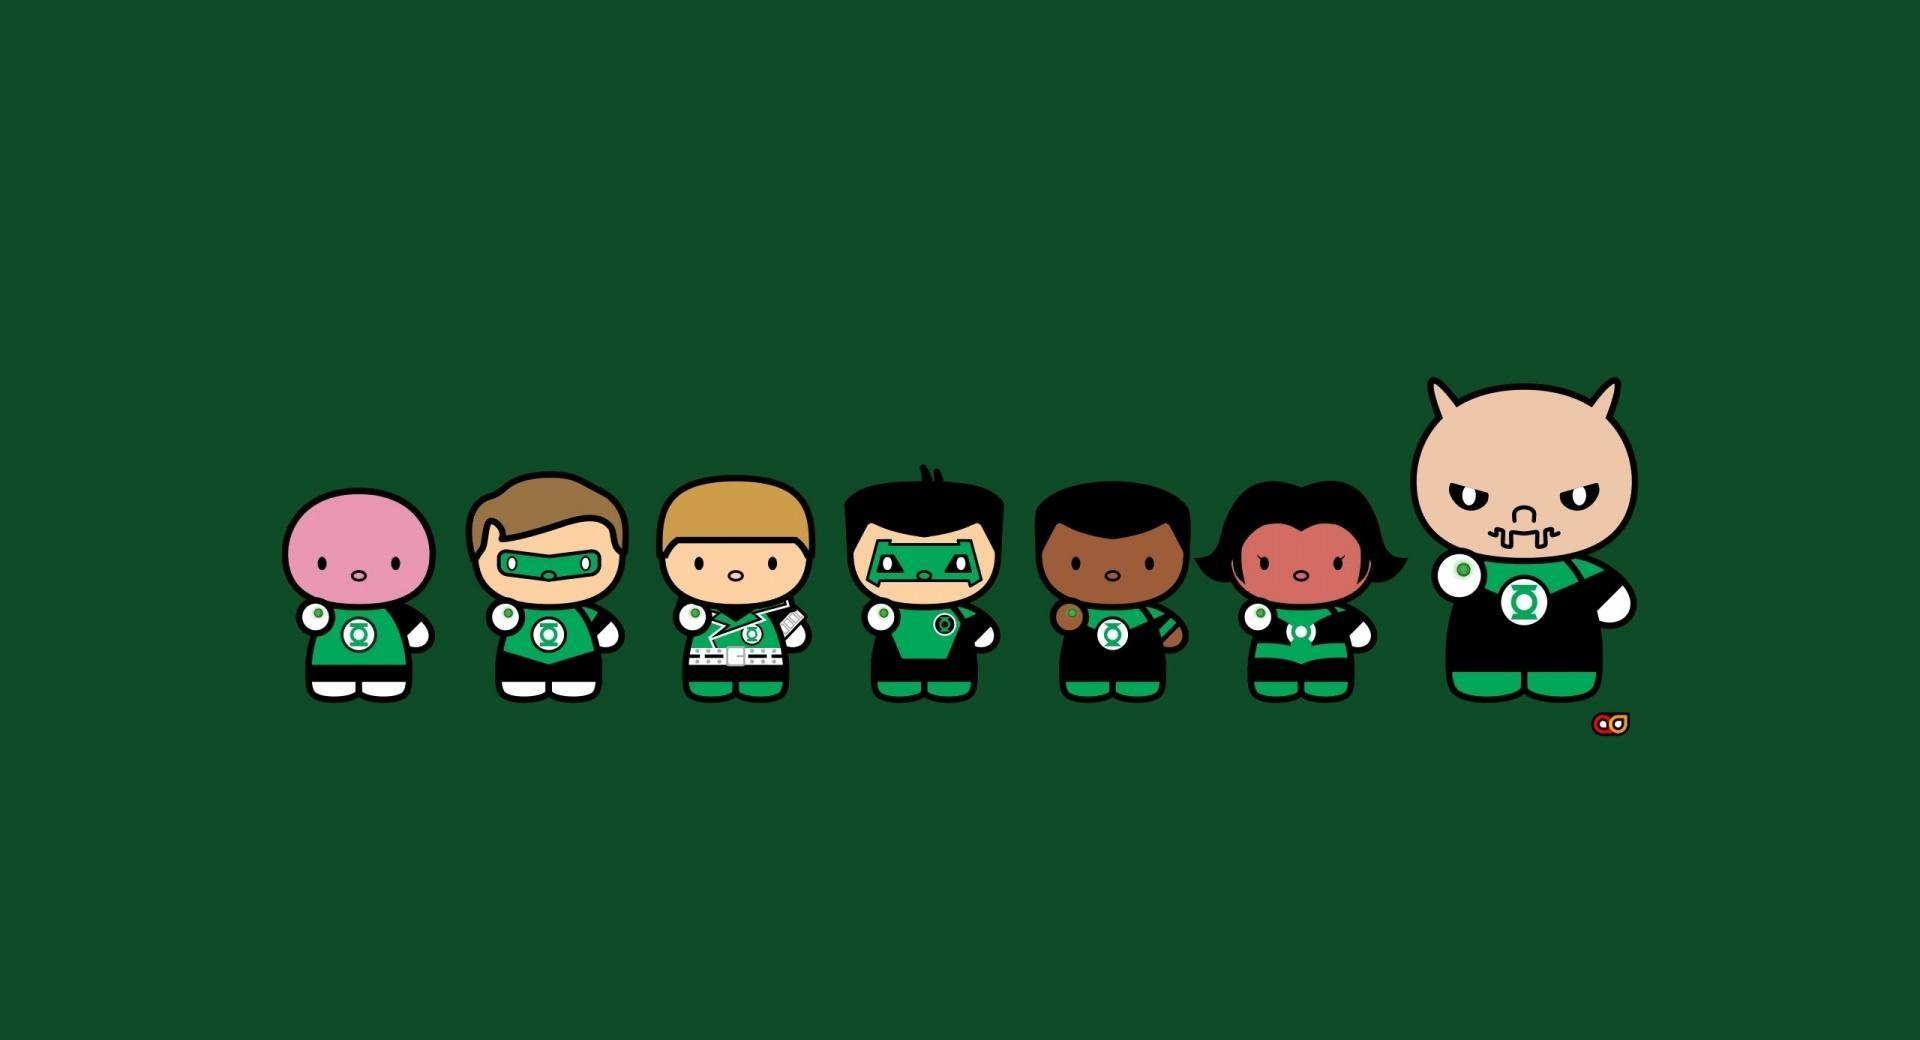 Chibi Green Lantern Corps wallpapers HD quality